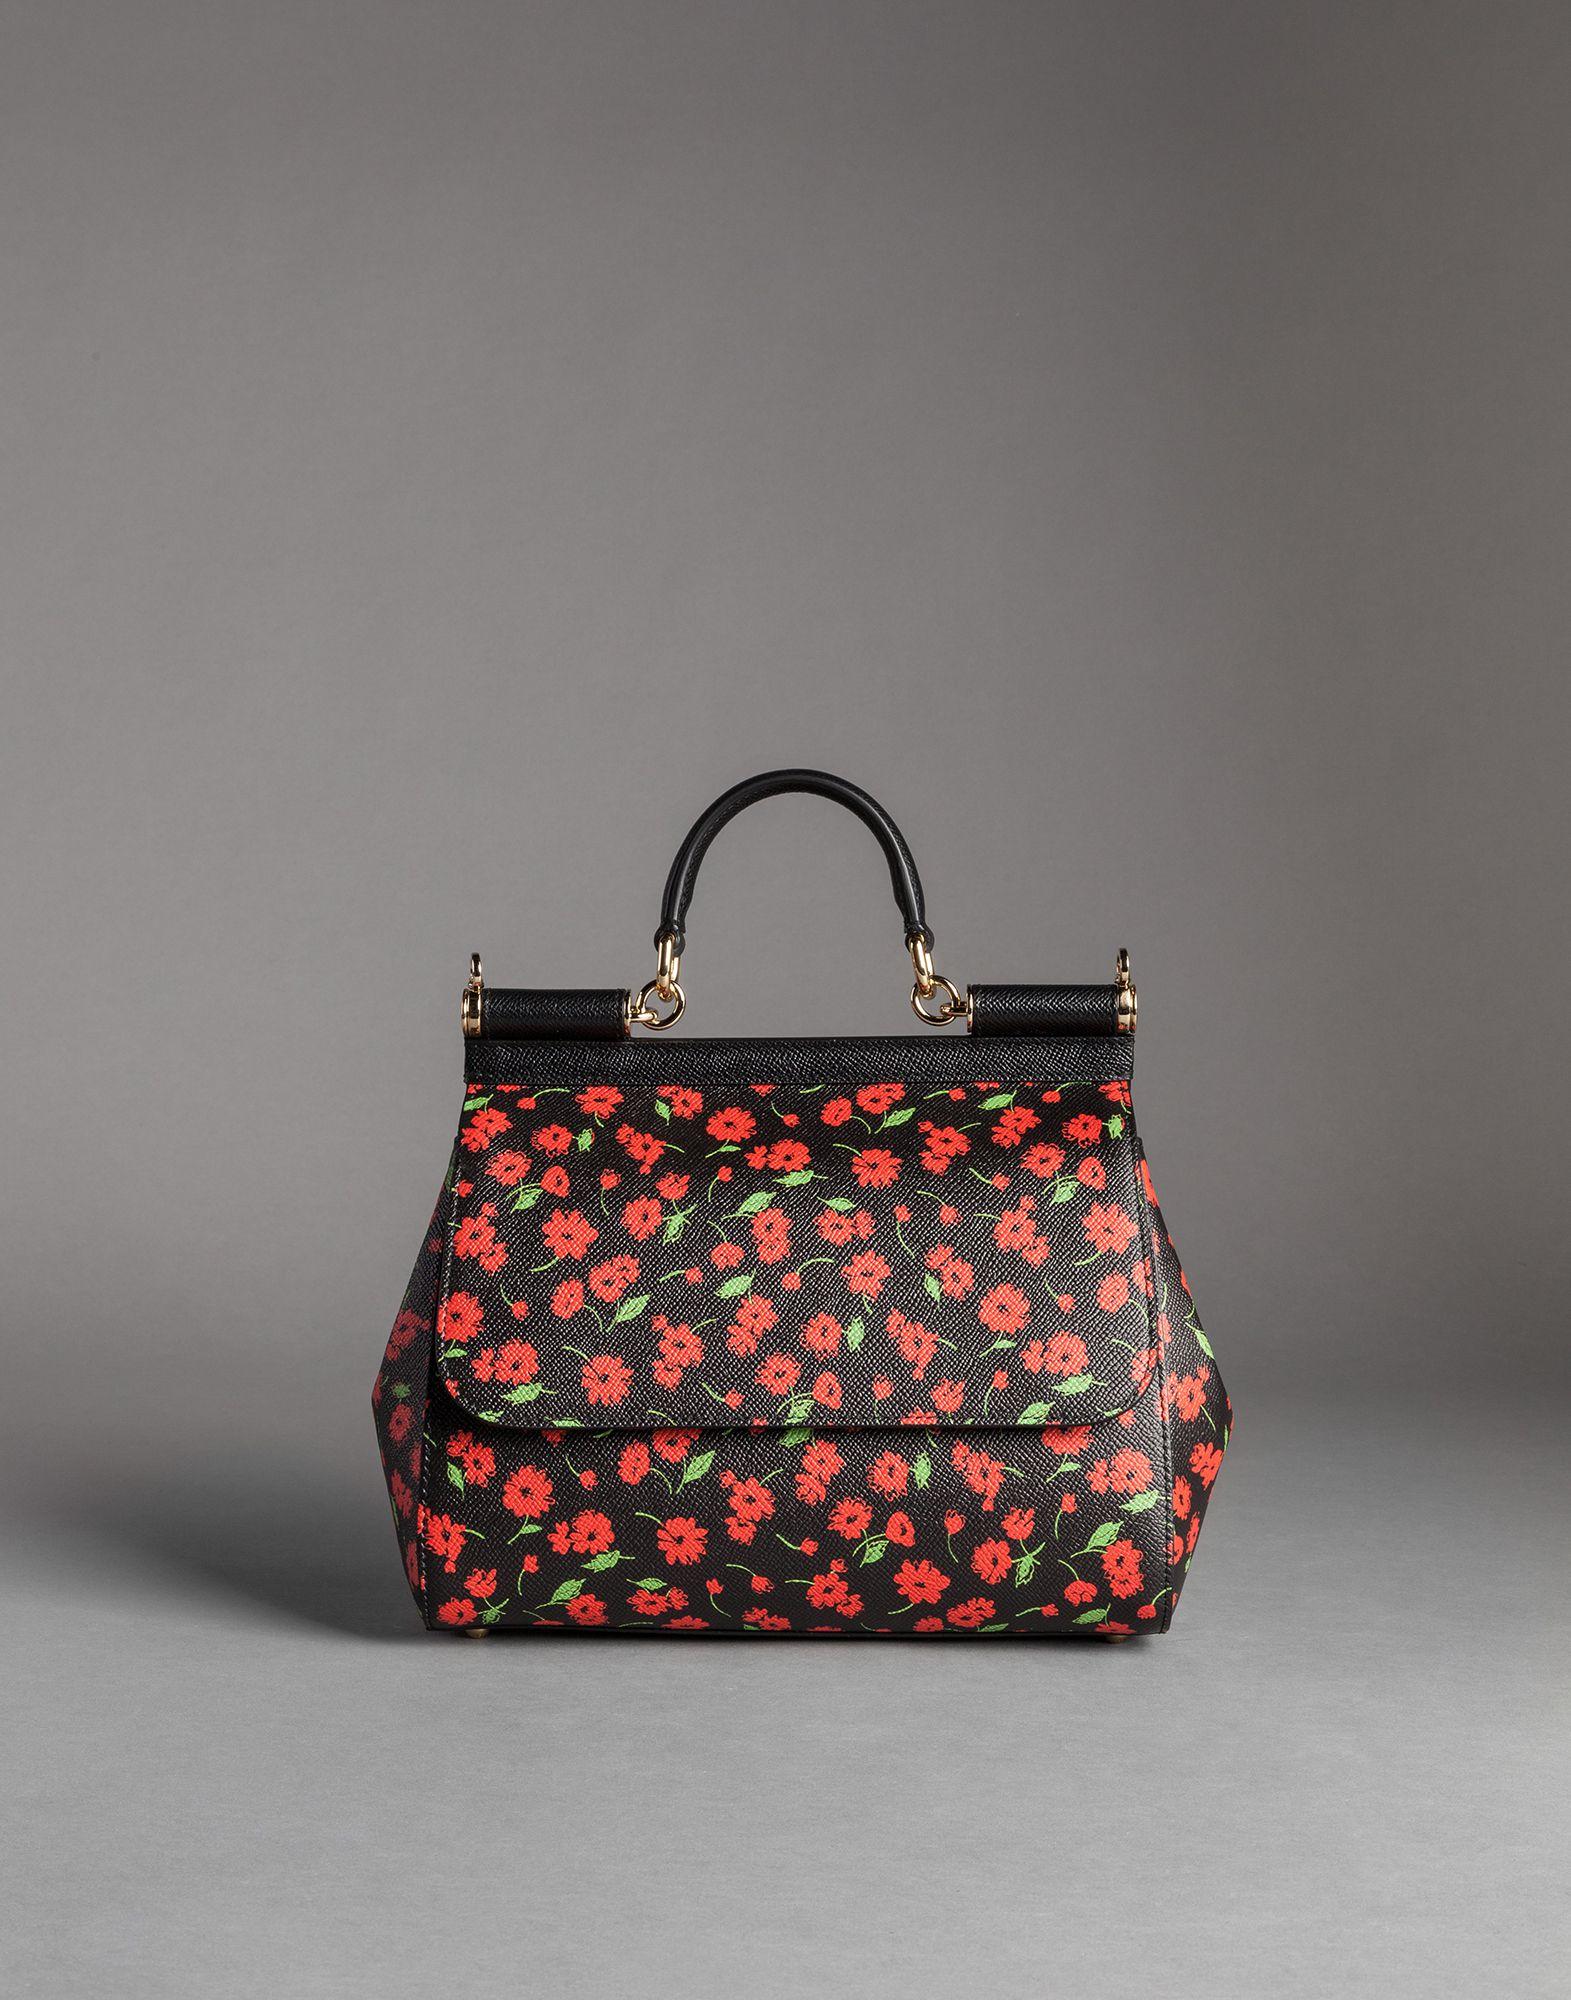 999f5d214b6 Dolce & Gabbana Flower Print Dauphine Calfskin Medium Sicily Bag in ...